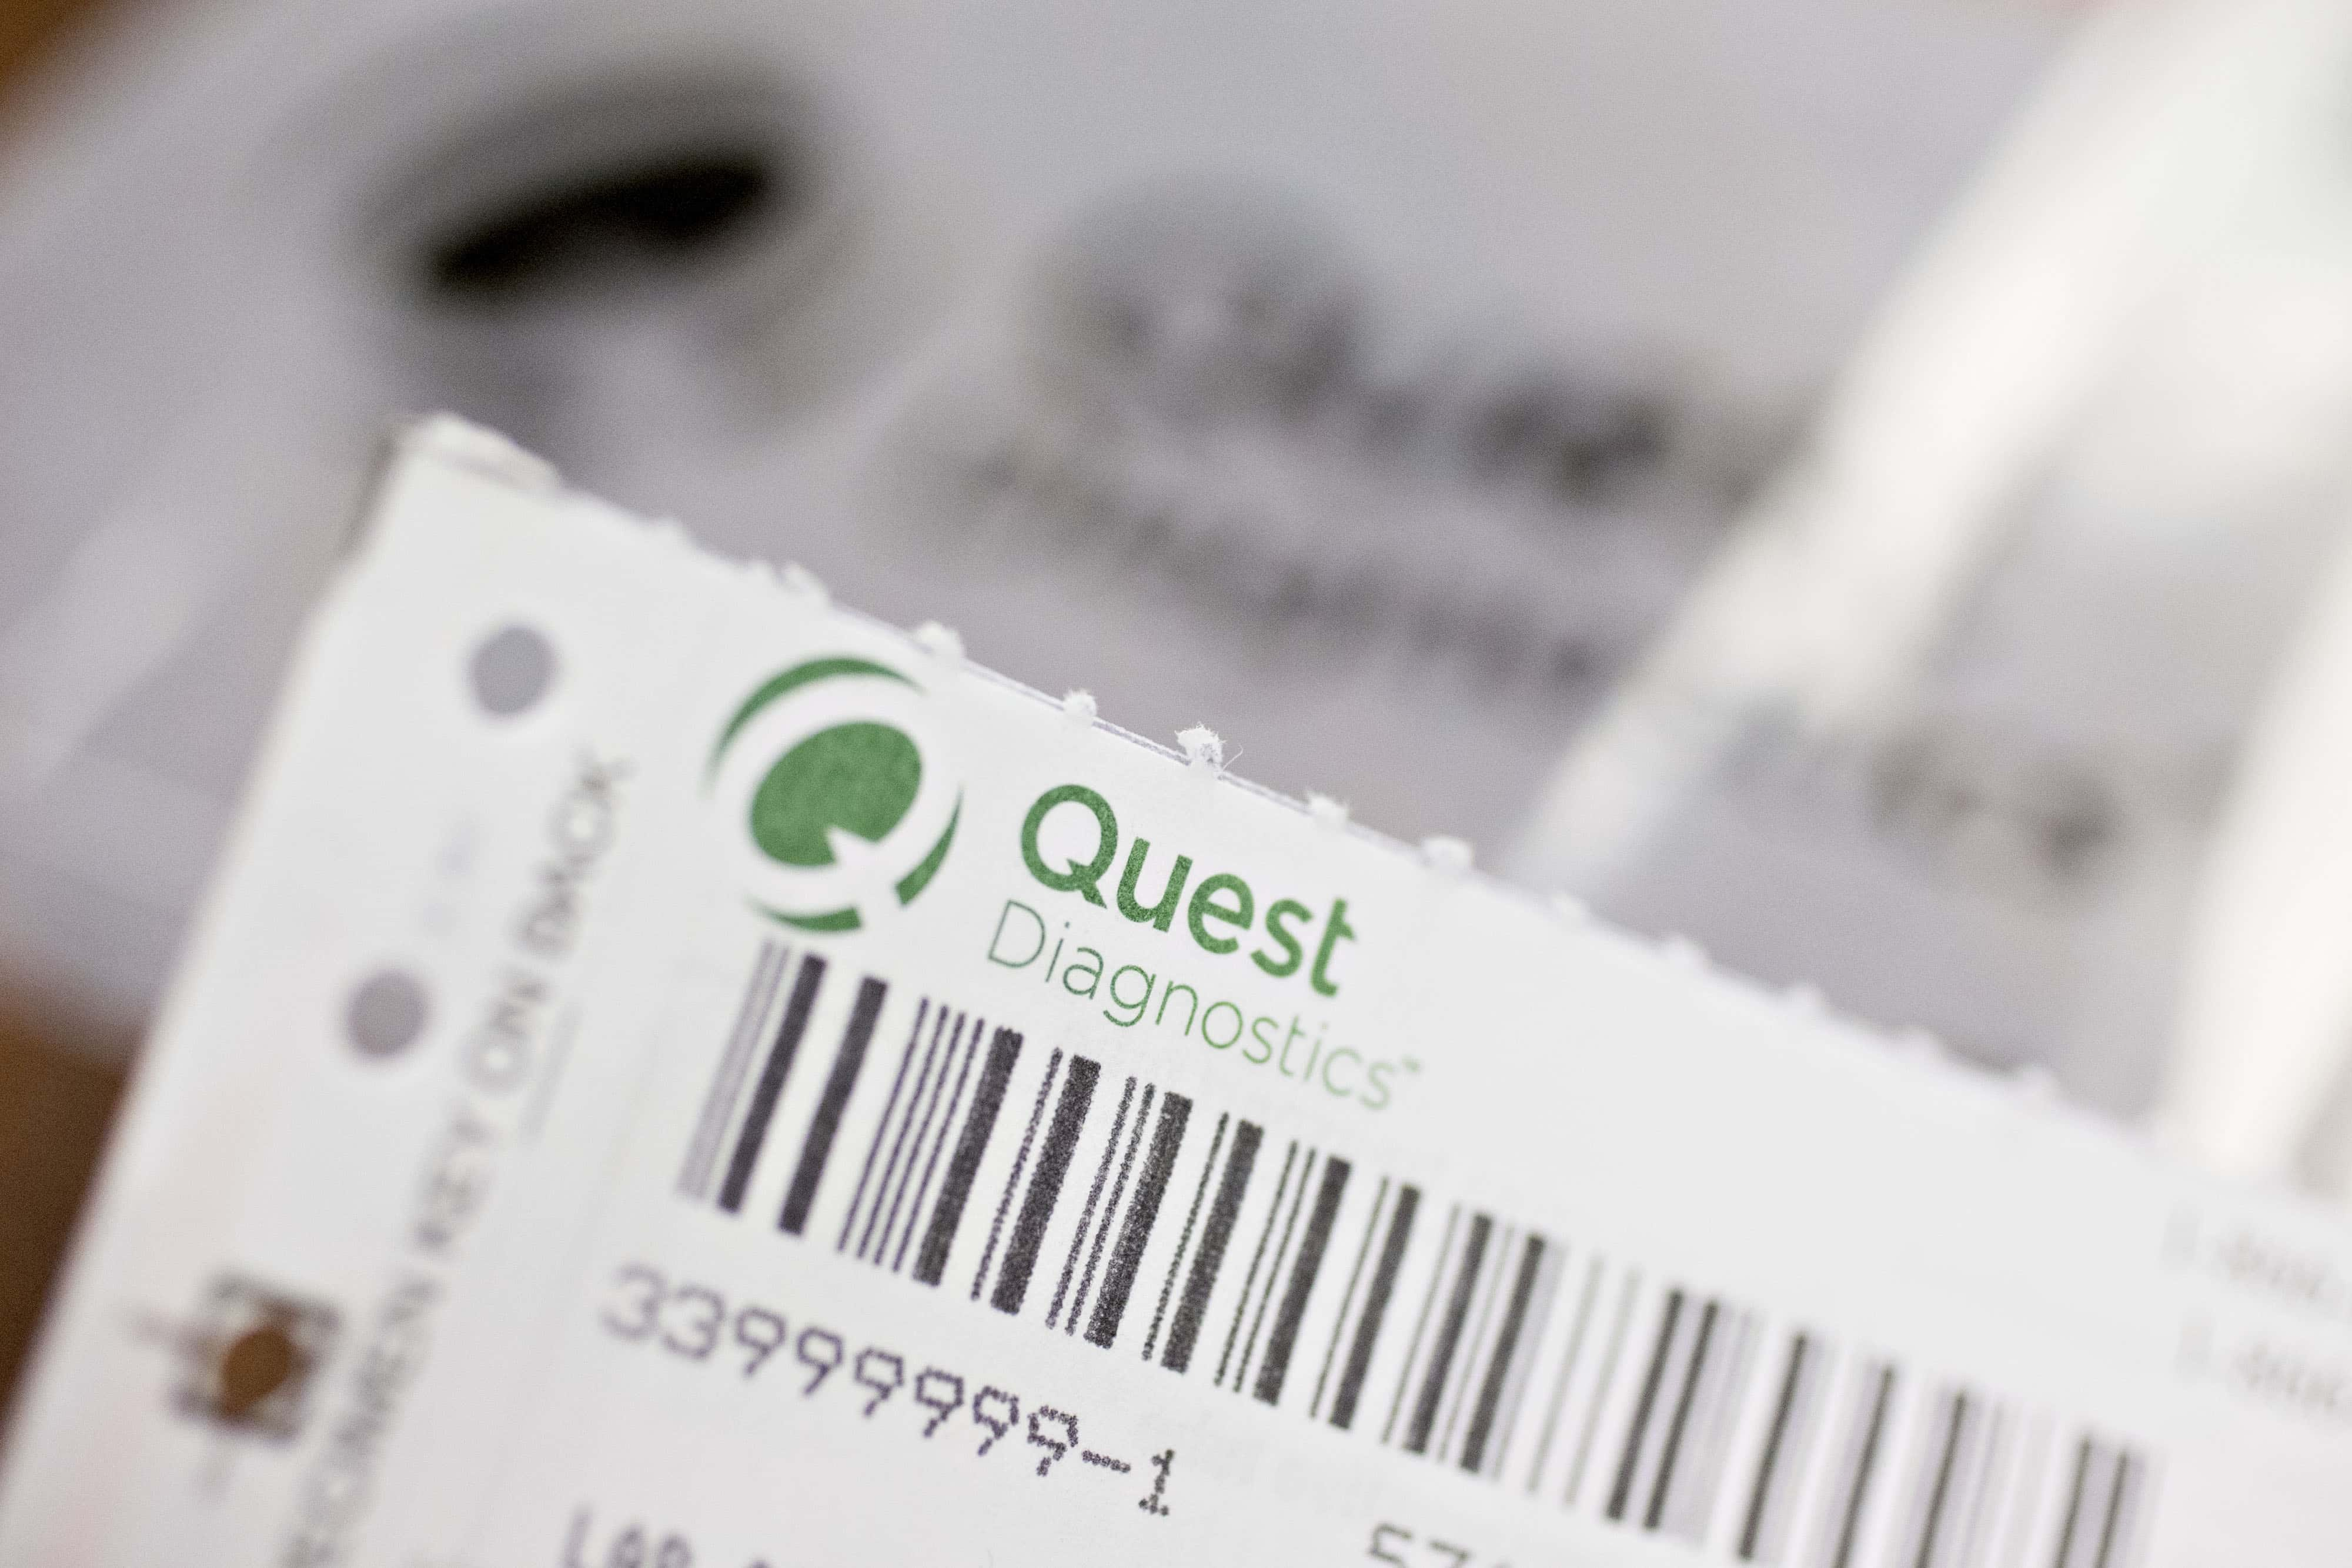 Image result for quest diagnostics breach